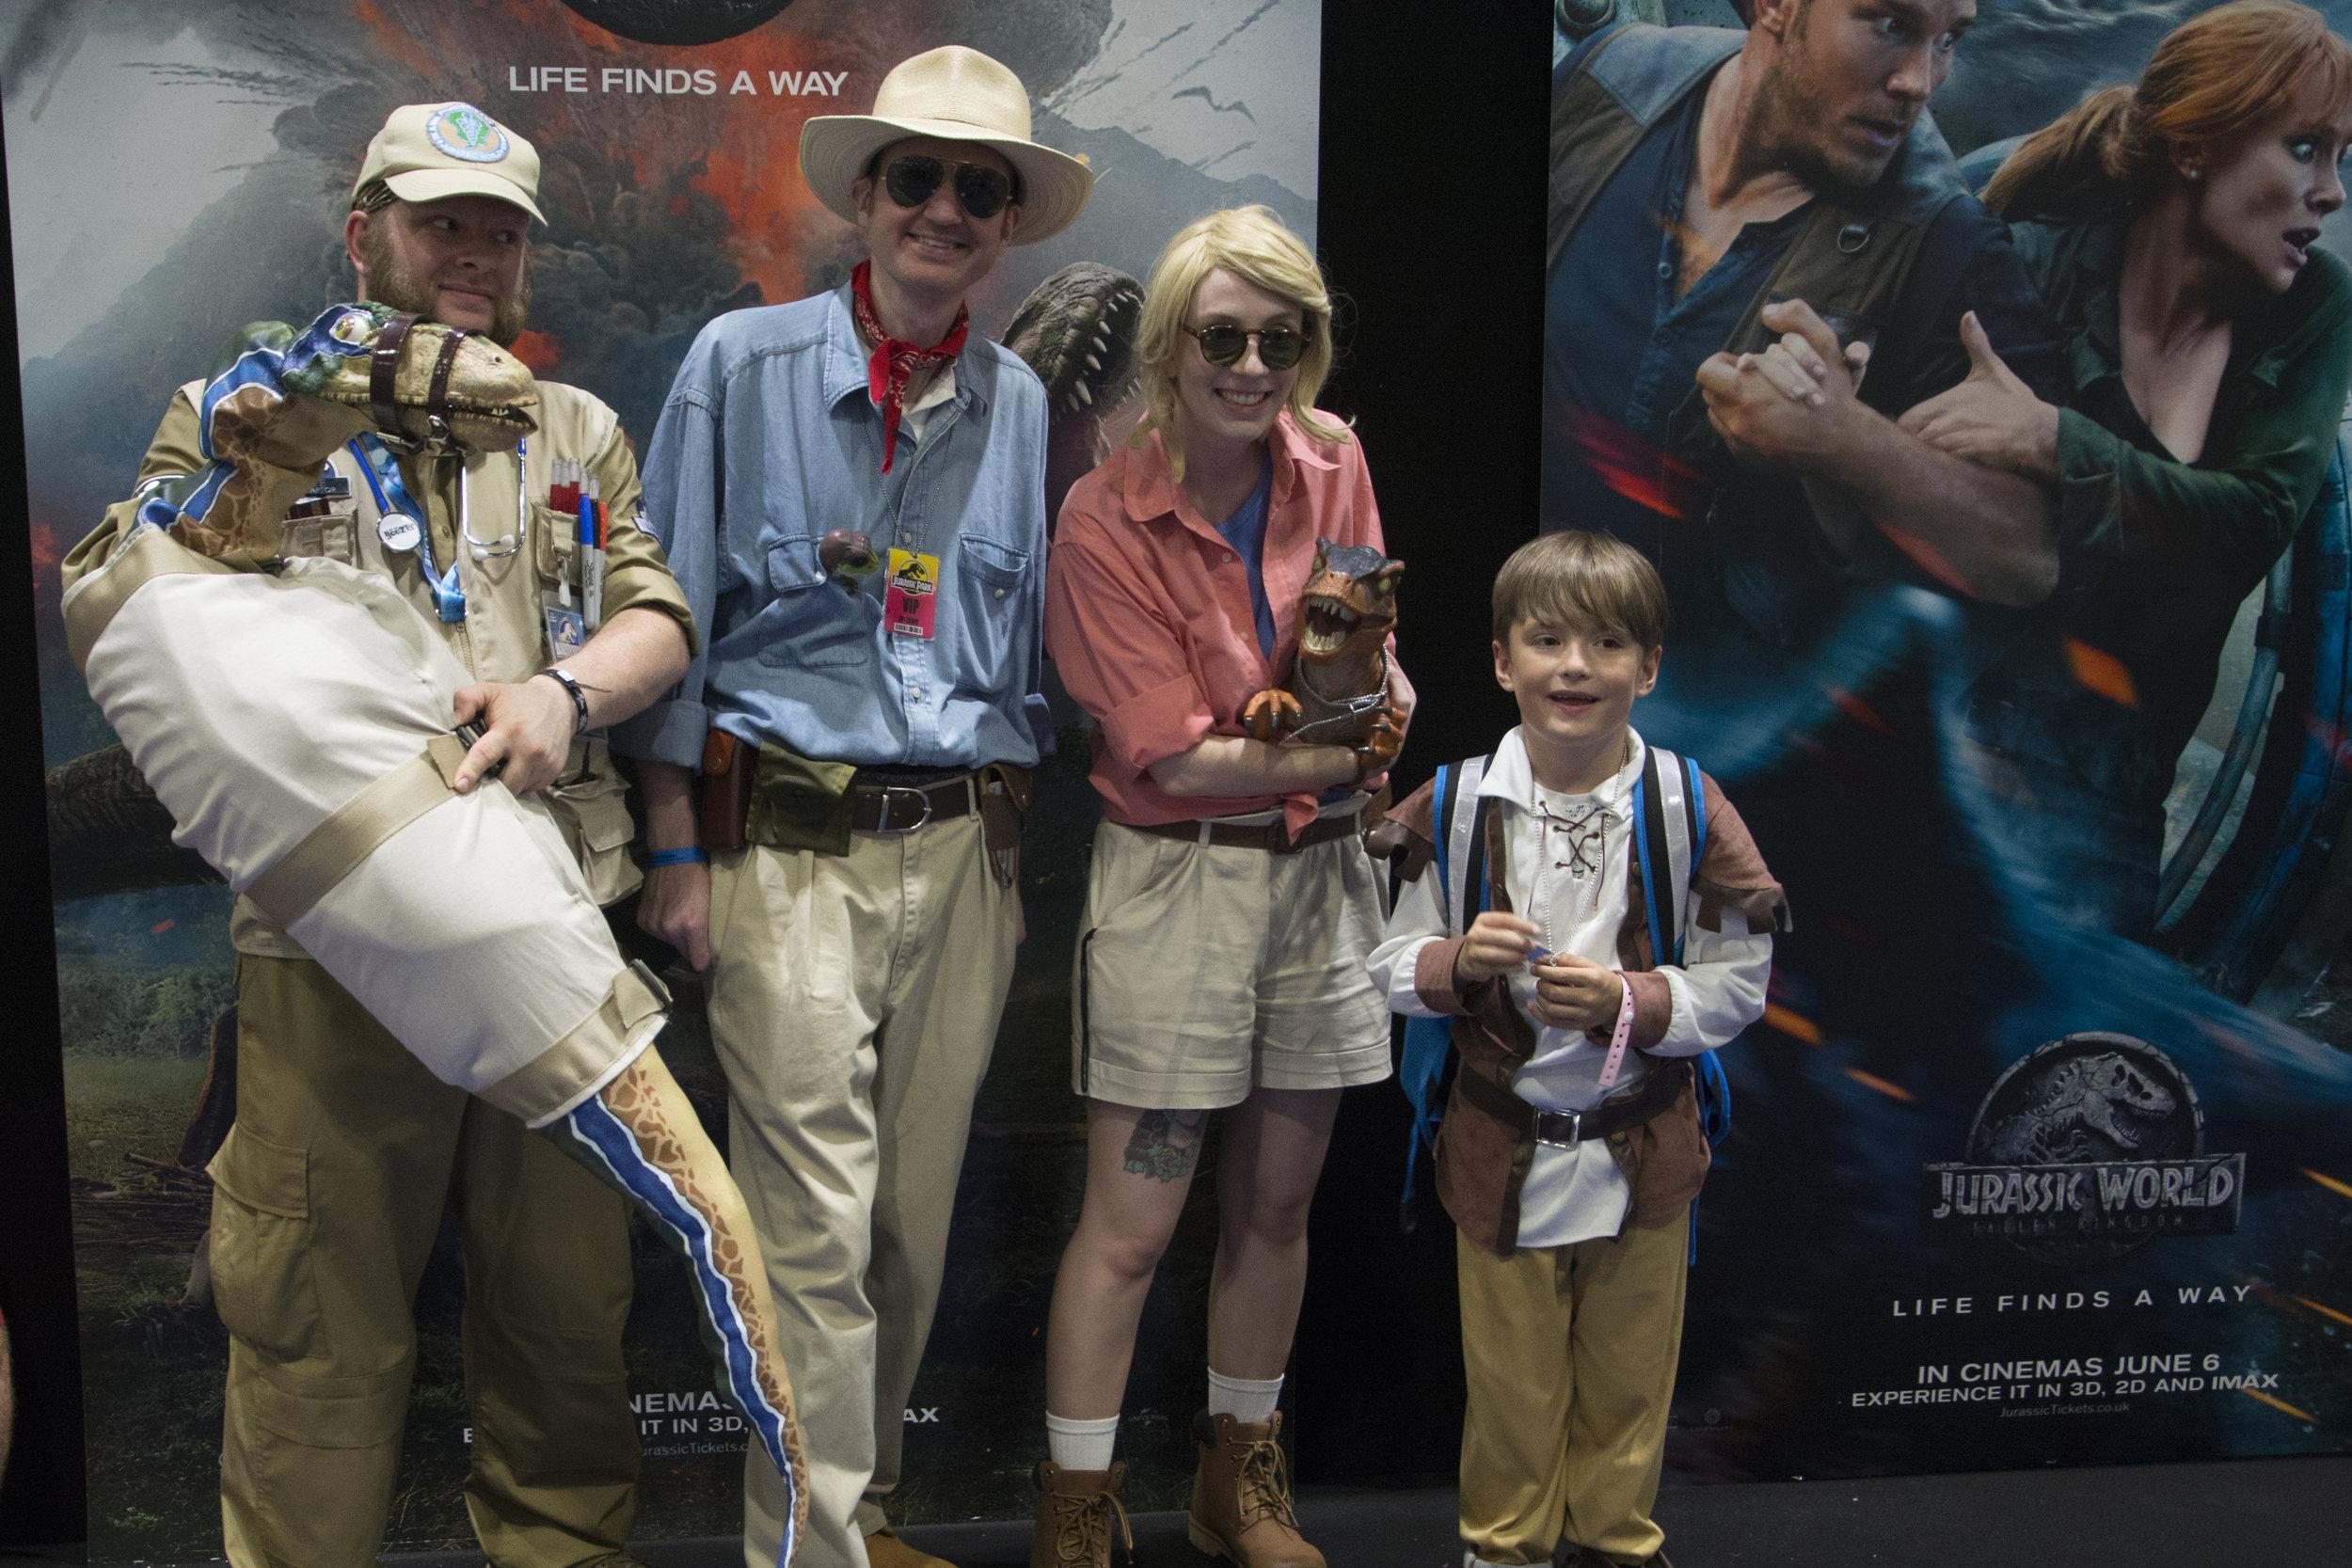 Group with Boy 1.jpg